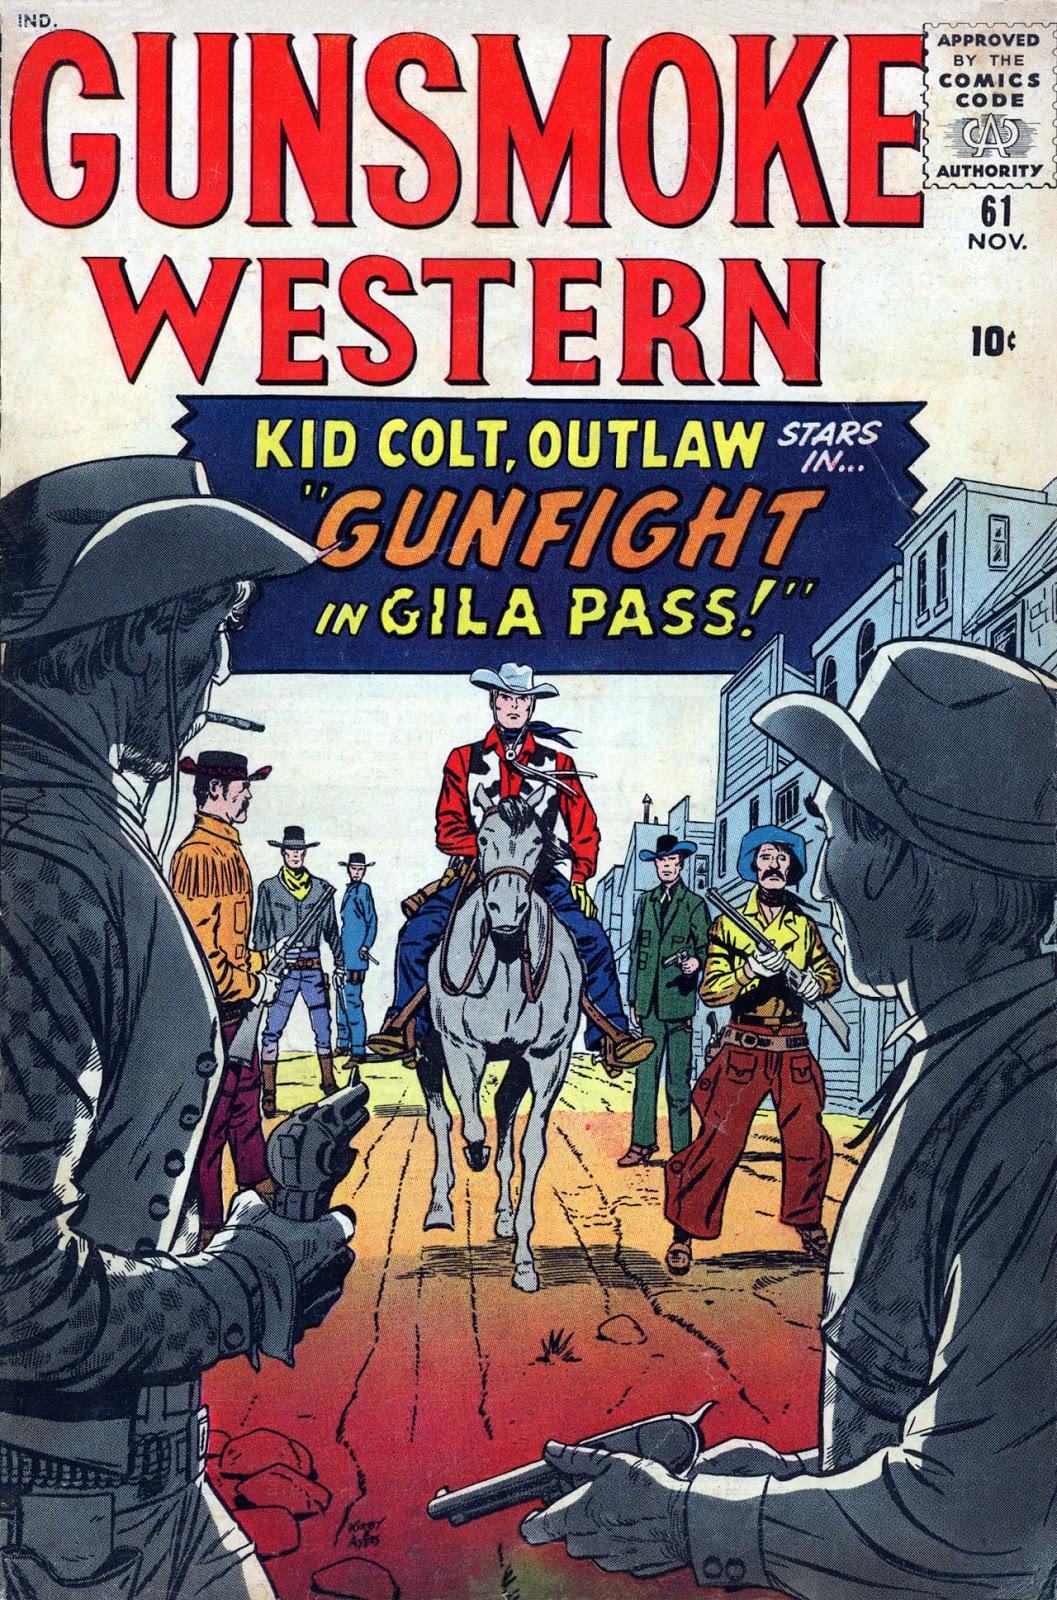 Gunsmoke Western issue 61 - Page 1